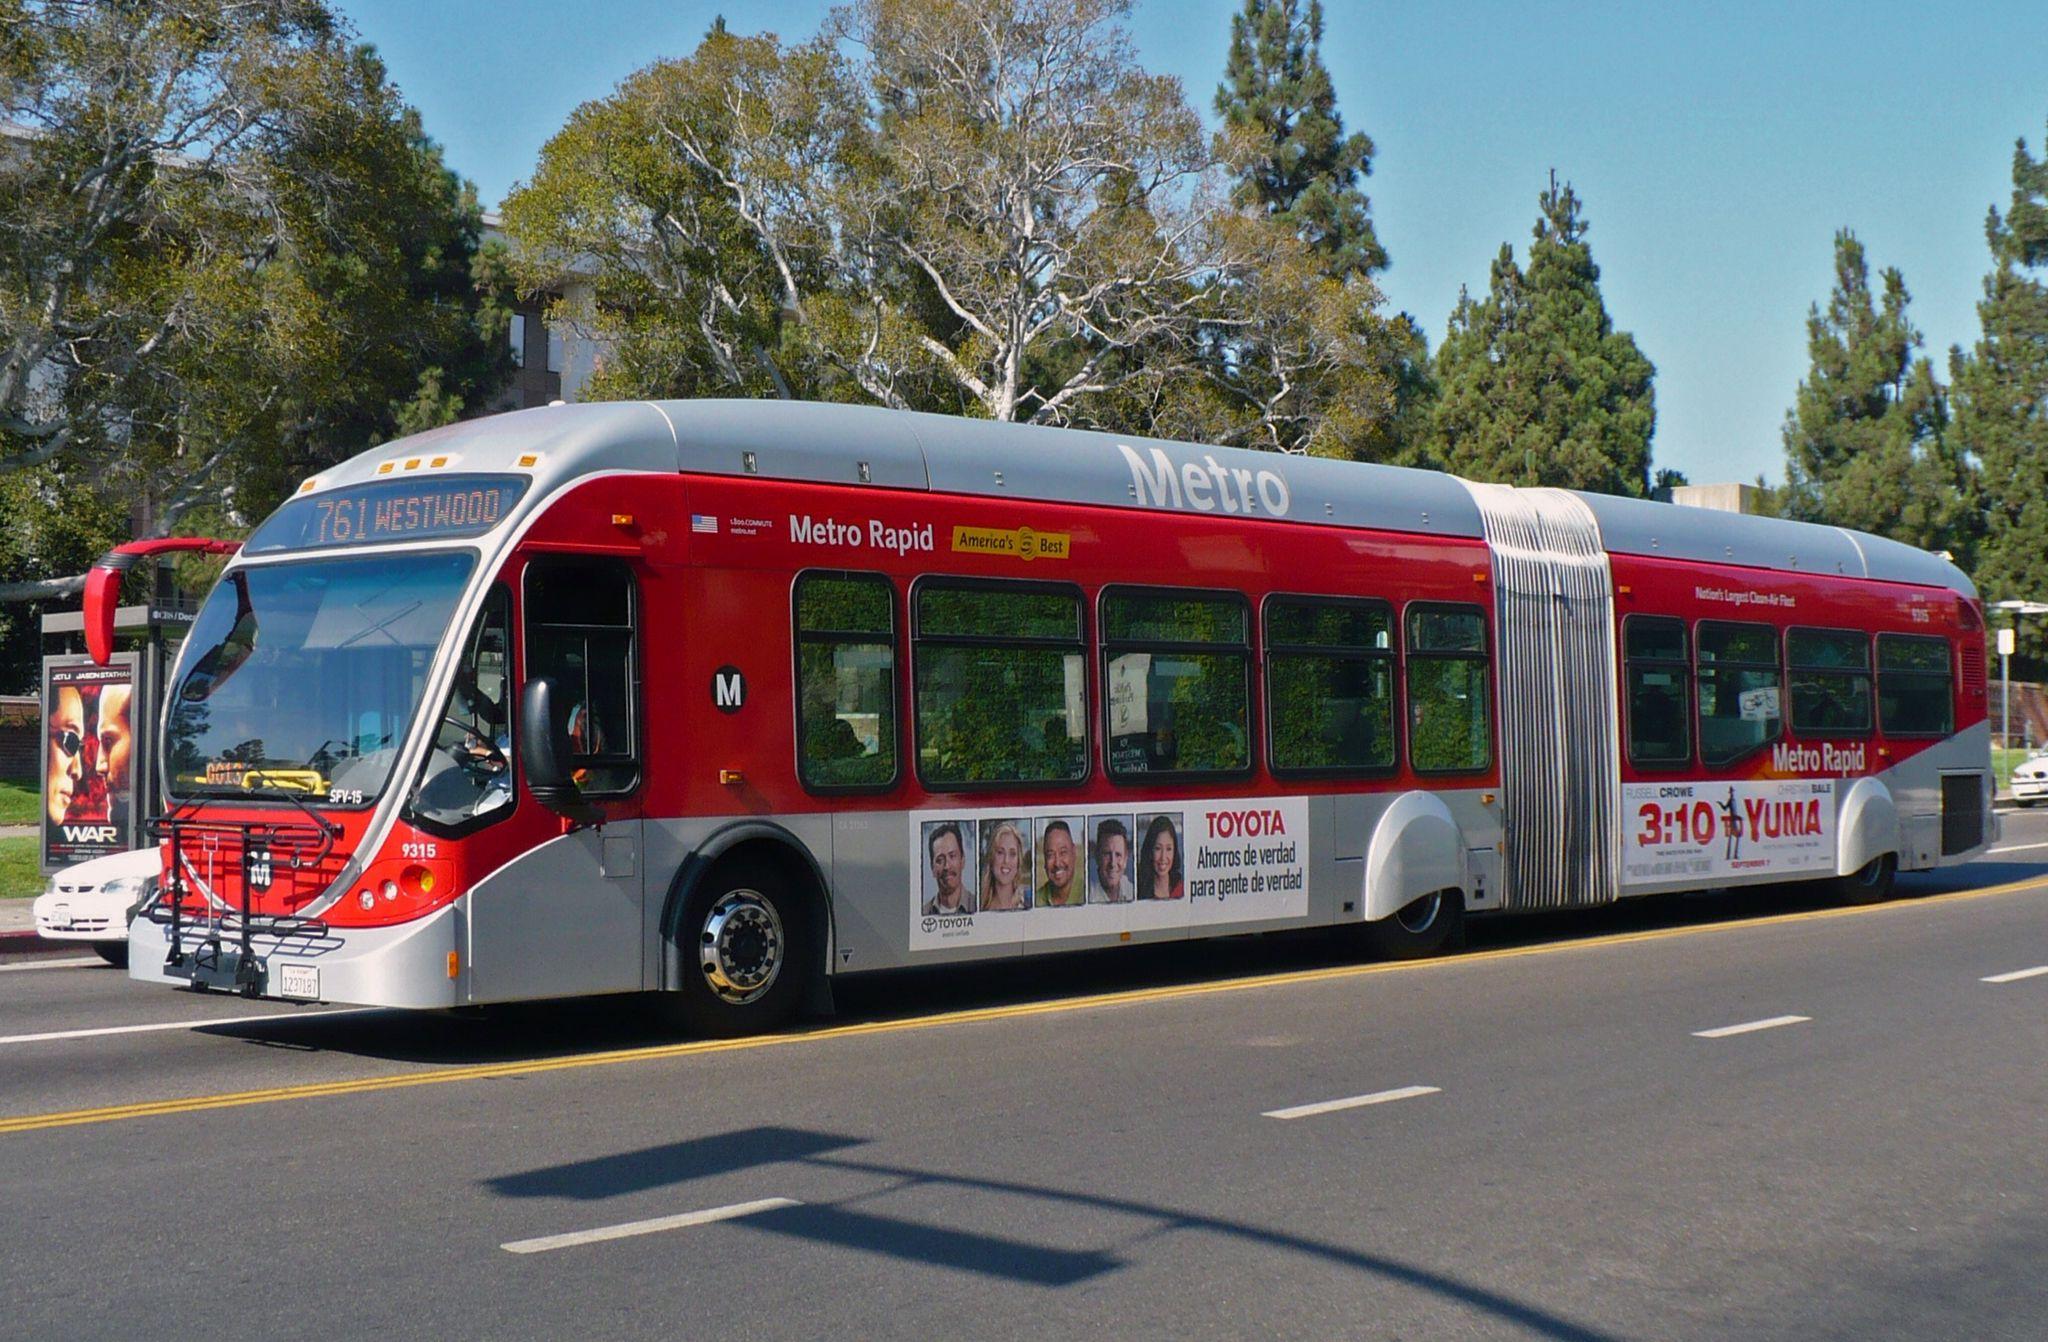 ee25c96b3ee5052884a35dc7d53811af - How To Get From Lax To Hollywood By Public Transportation